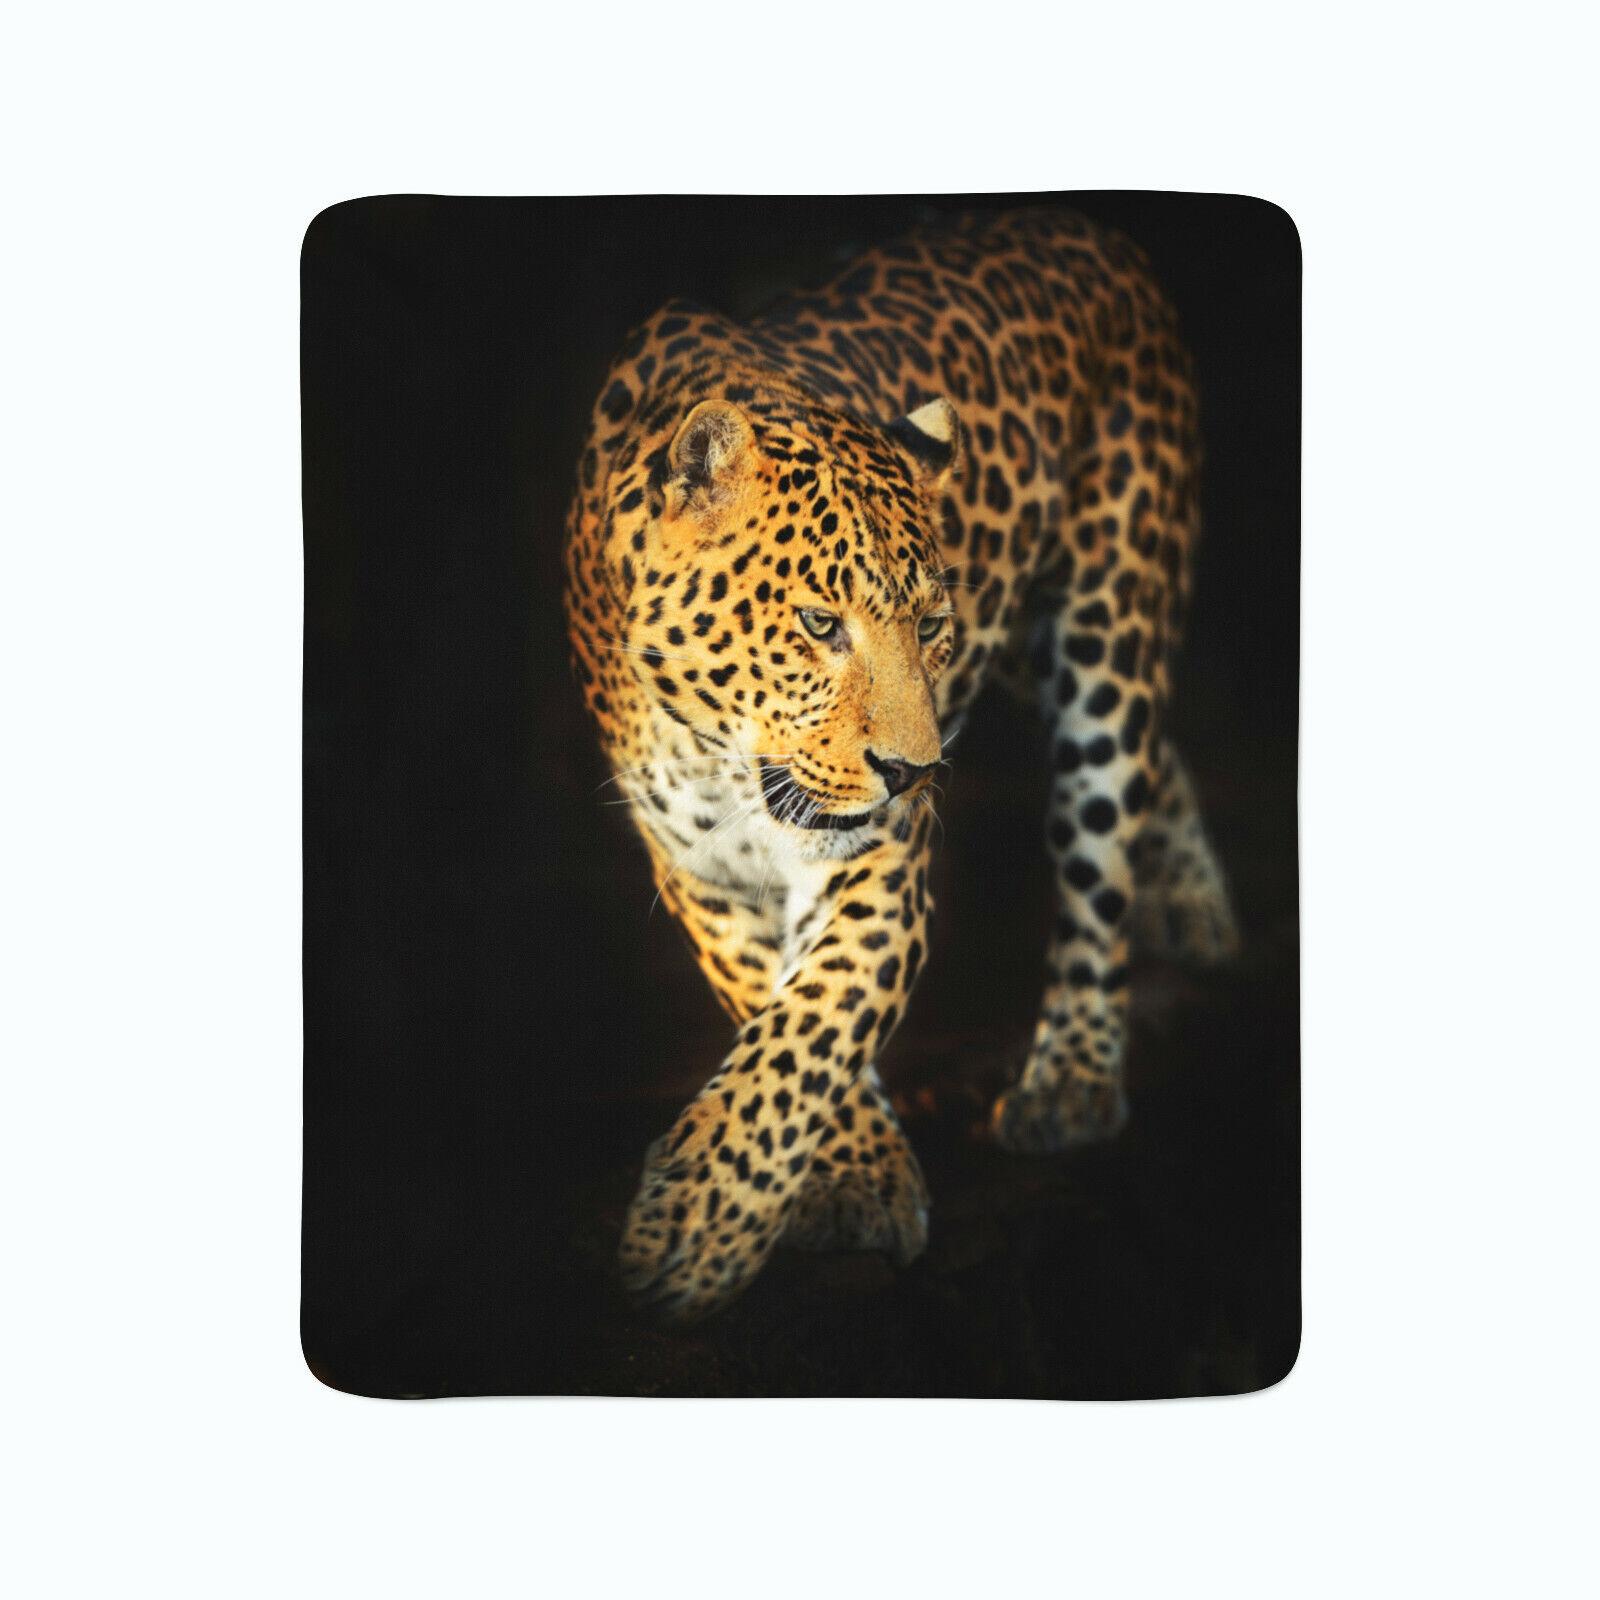 Fleece Decke Foto Decke Kuscheldecke mit Motiv Natur Tiere Beautiful Jaguar